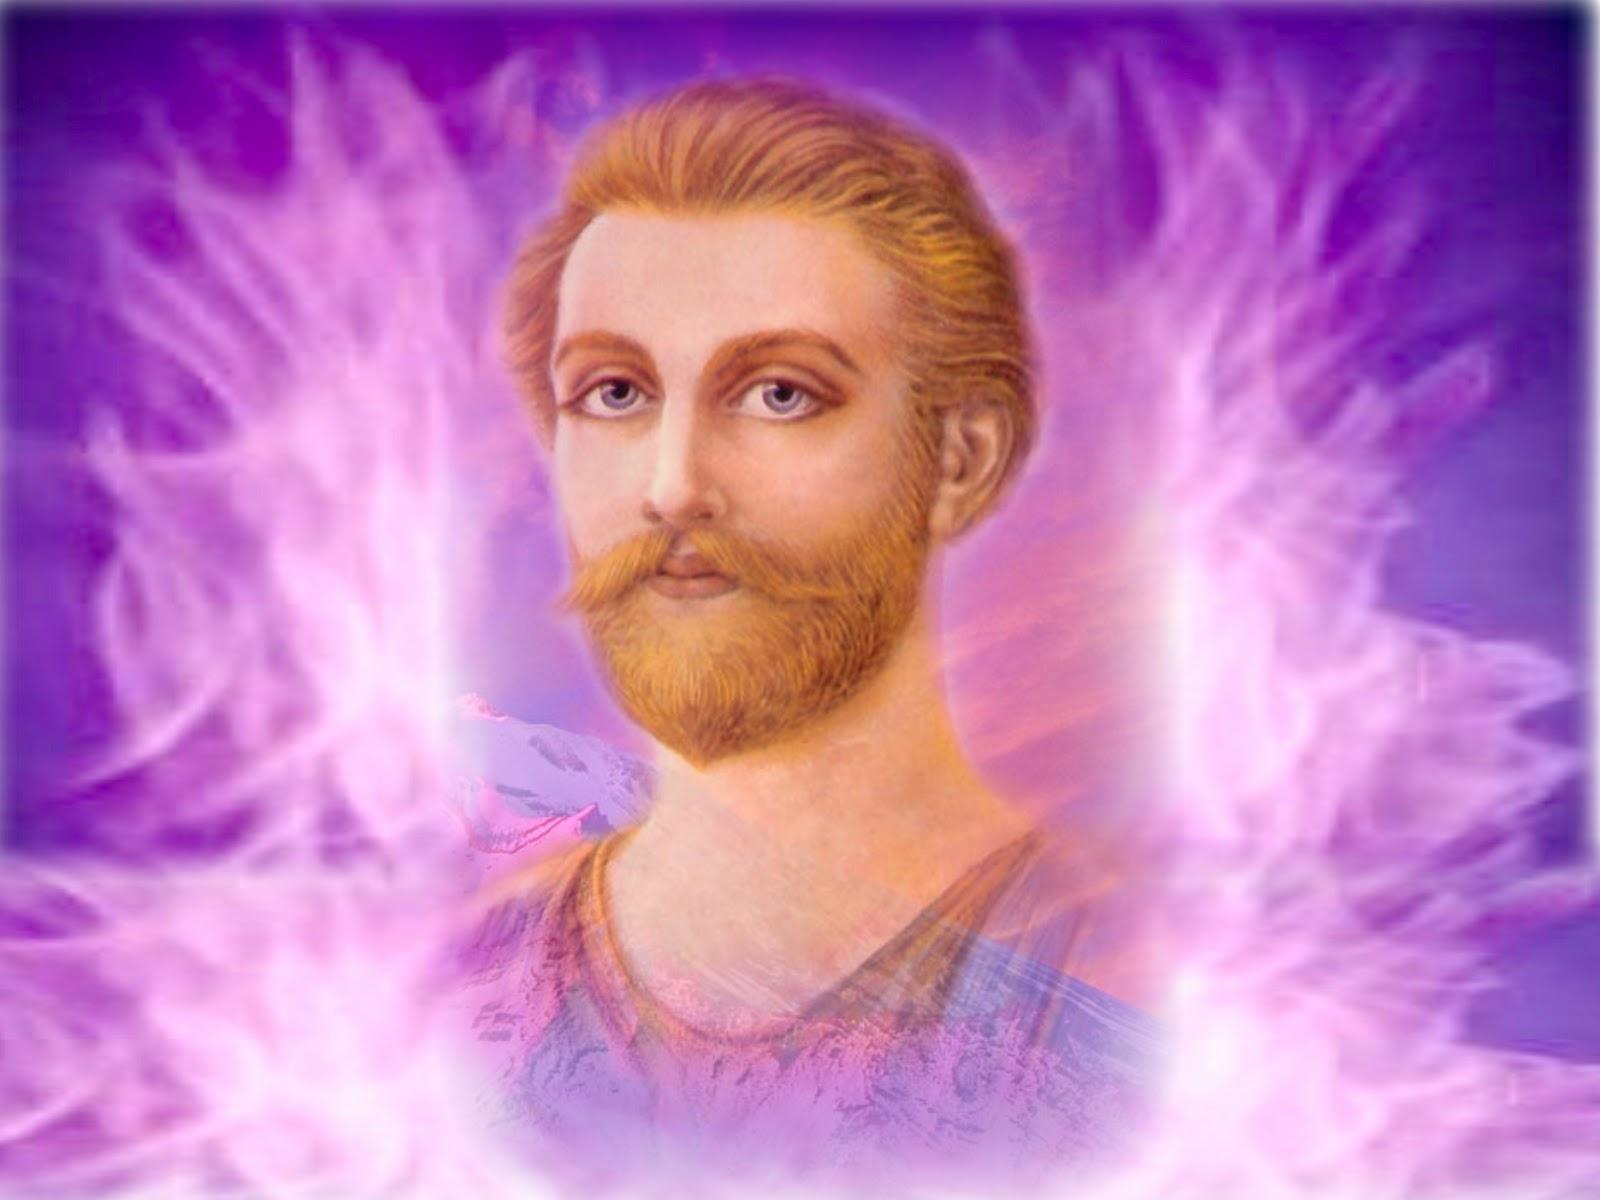 Saint_Germaine_violet_flame